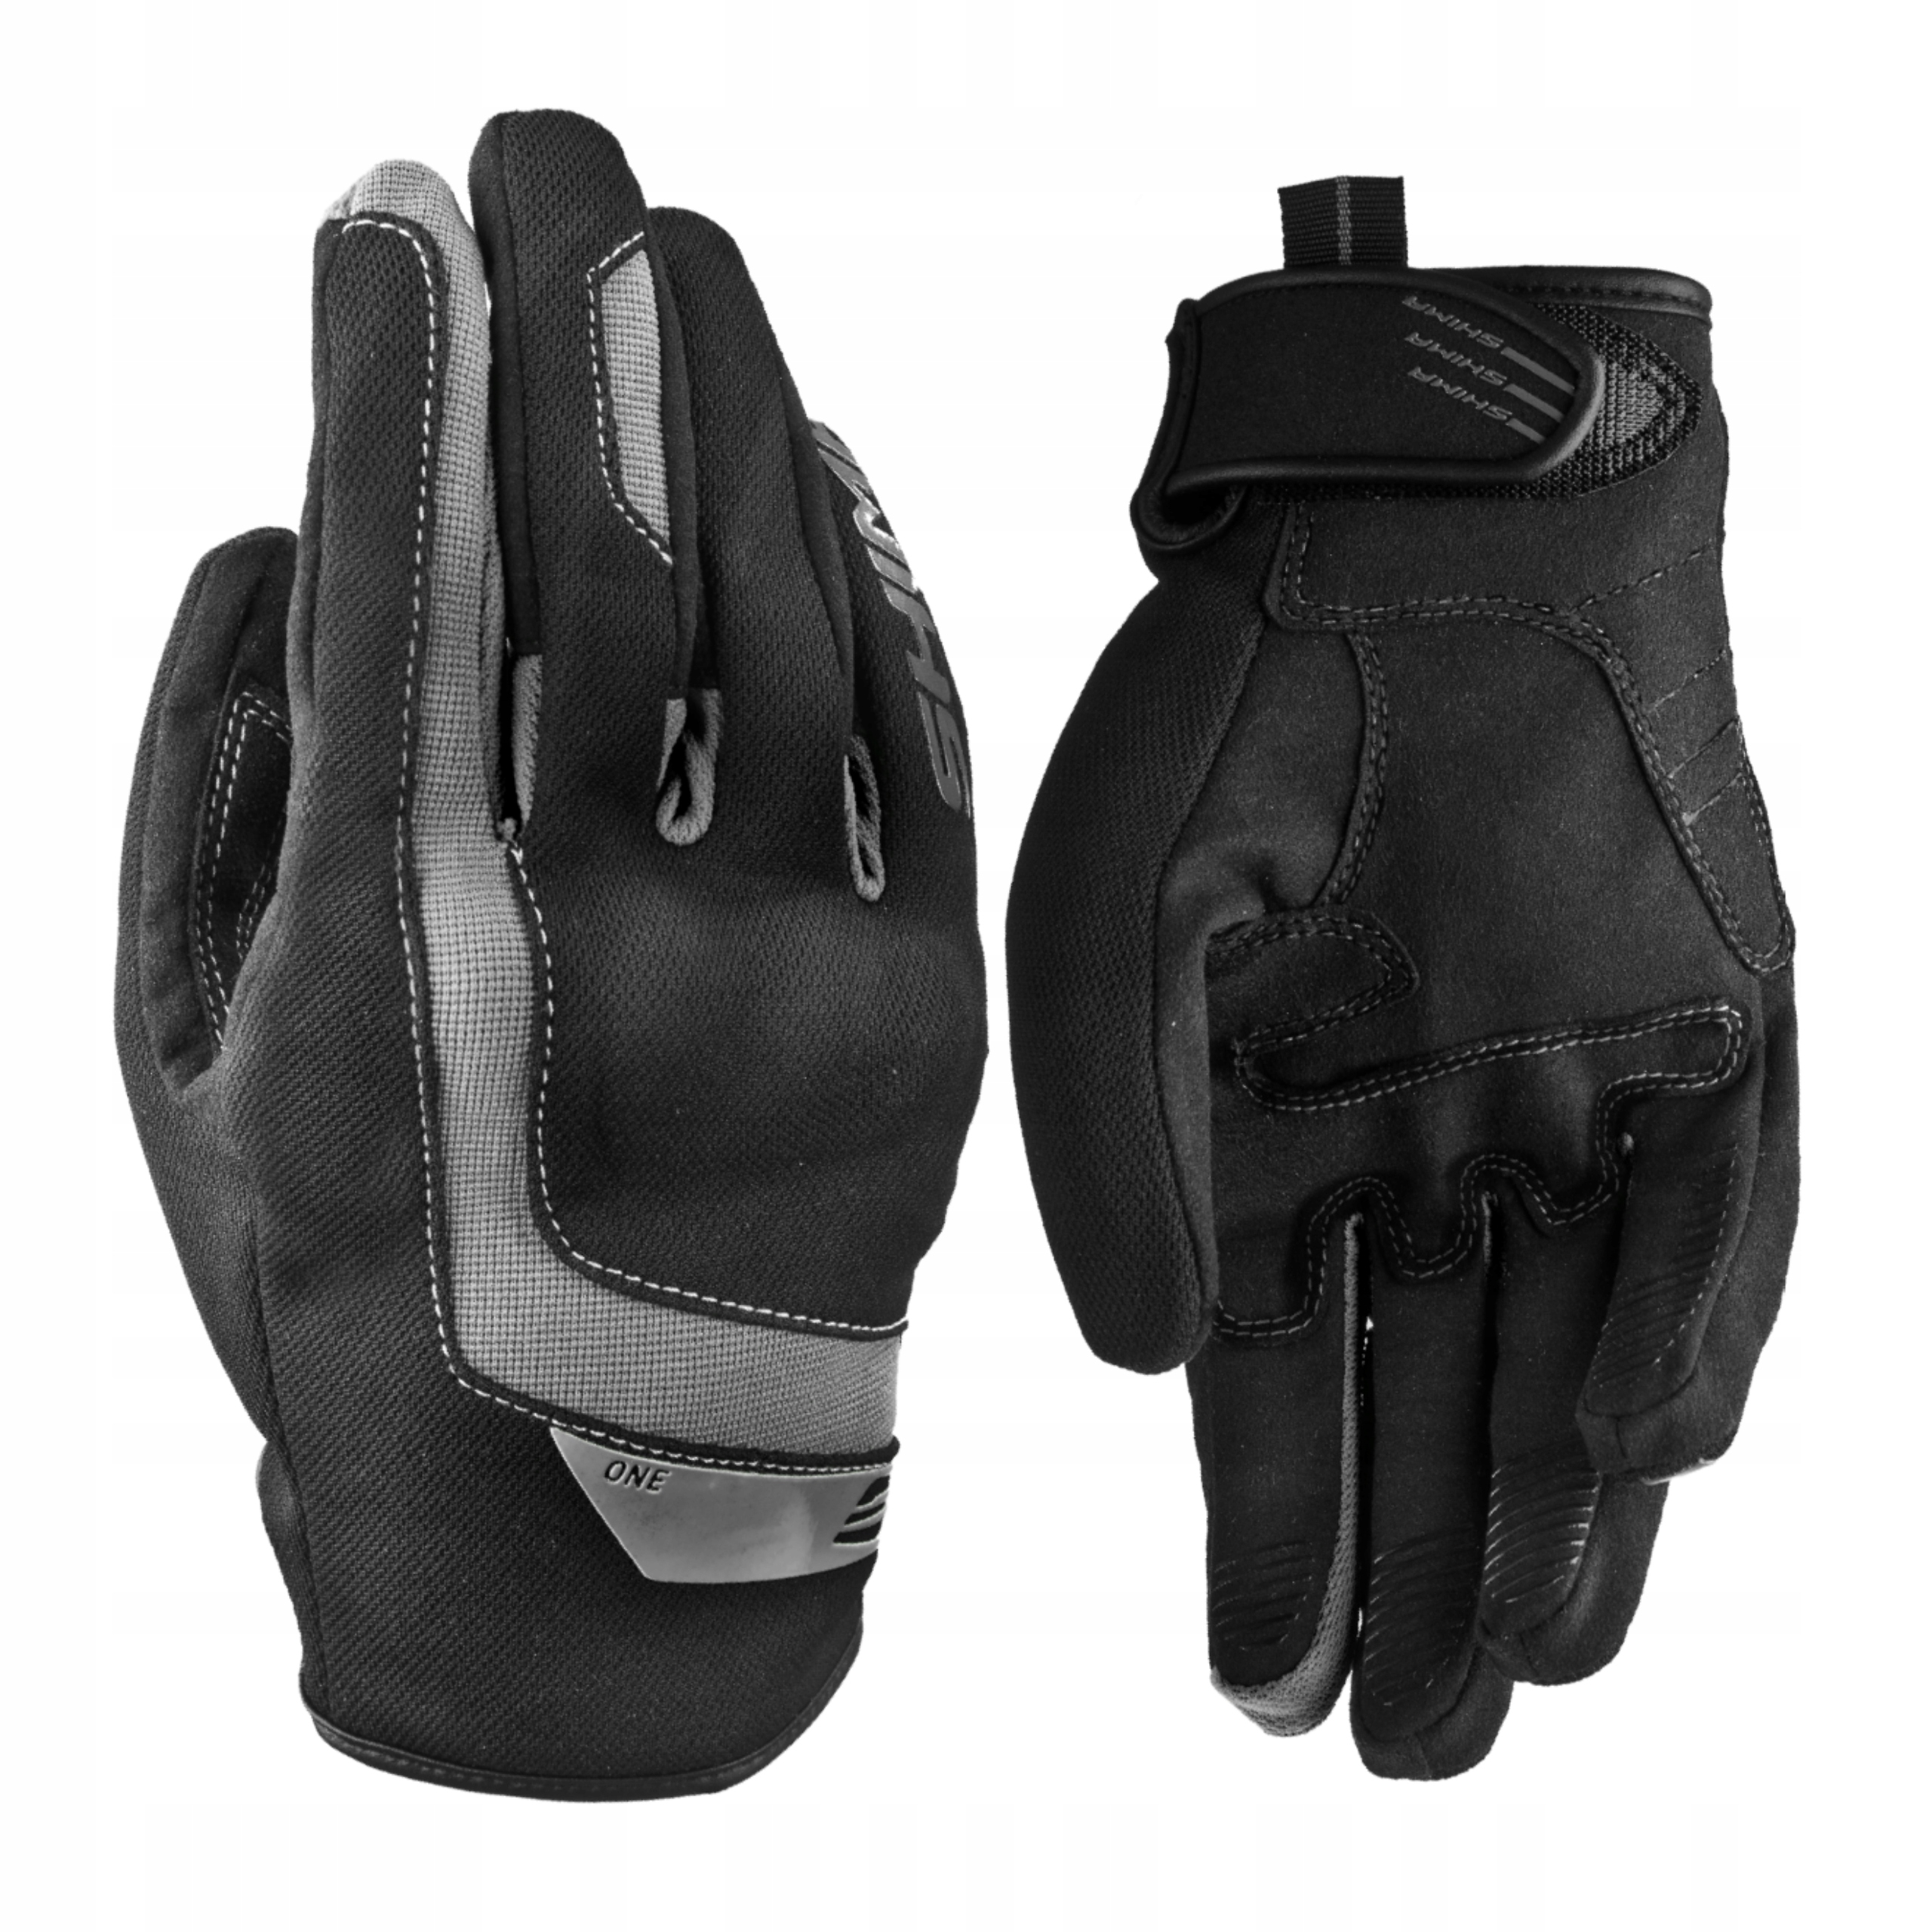 SHIMA ONE BLACK Rękawice motocyklowe lato GRATISY